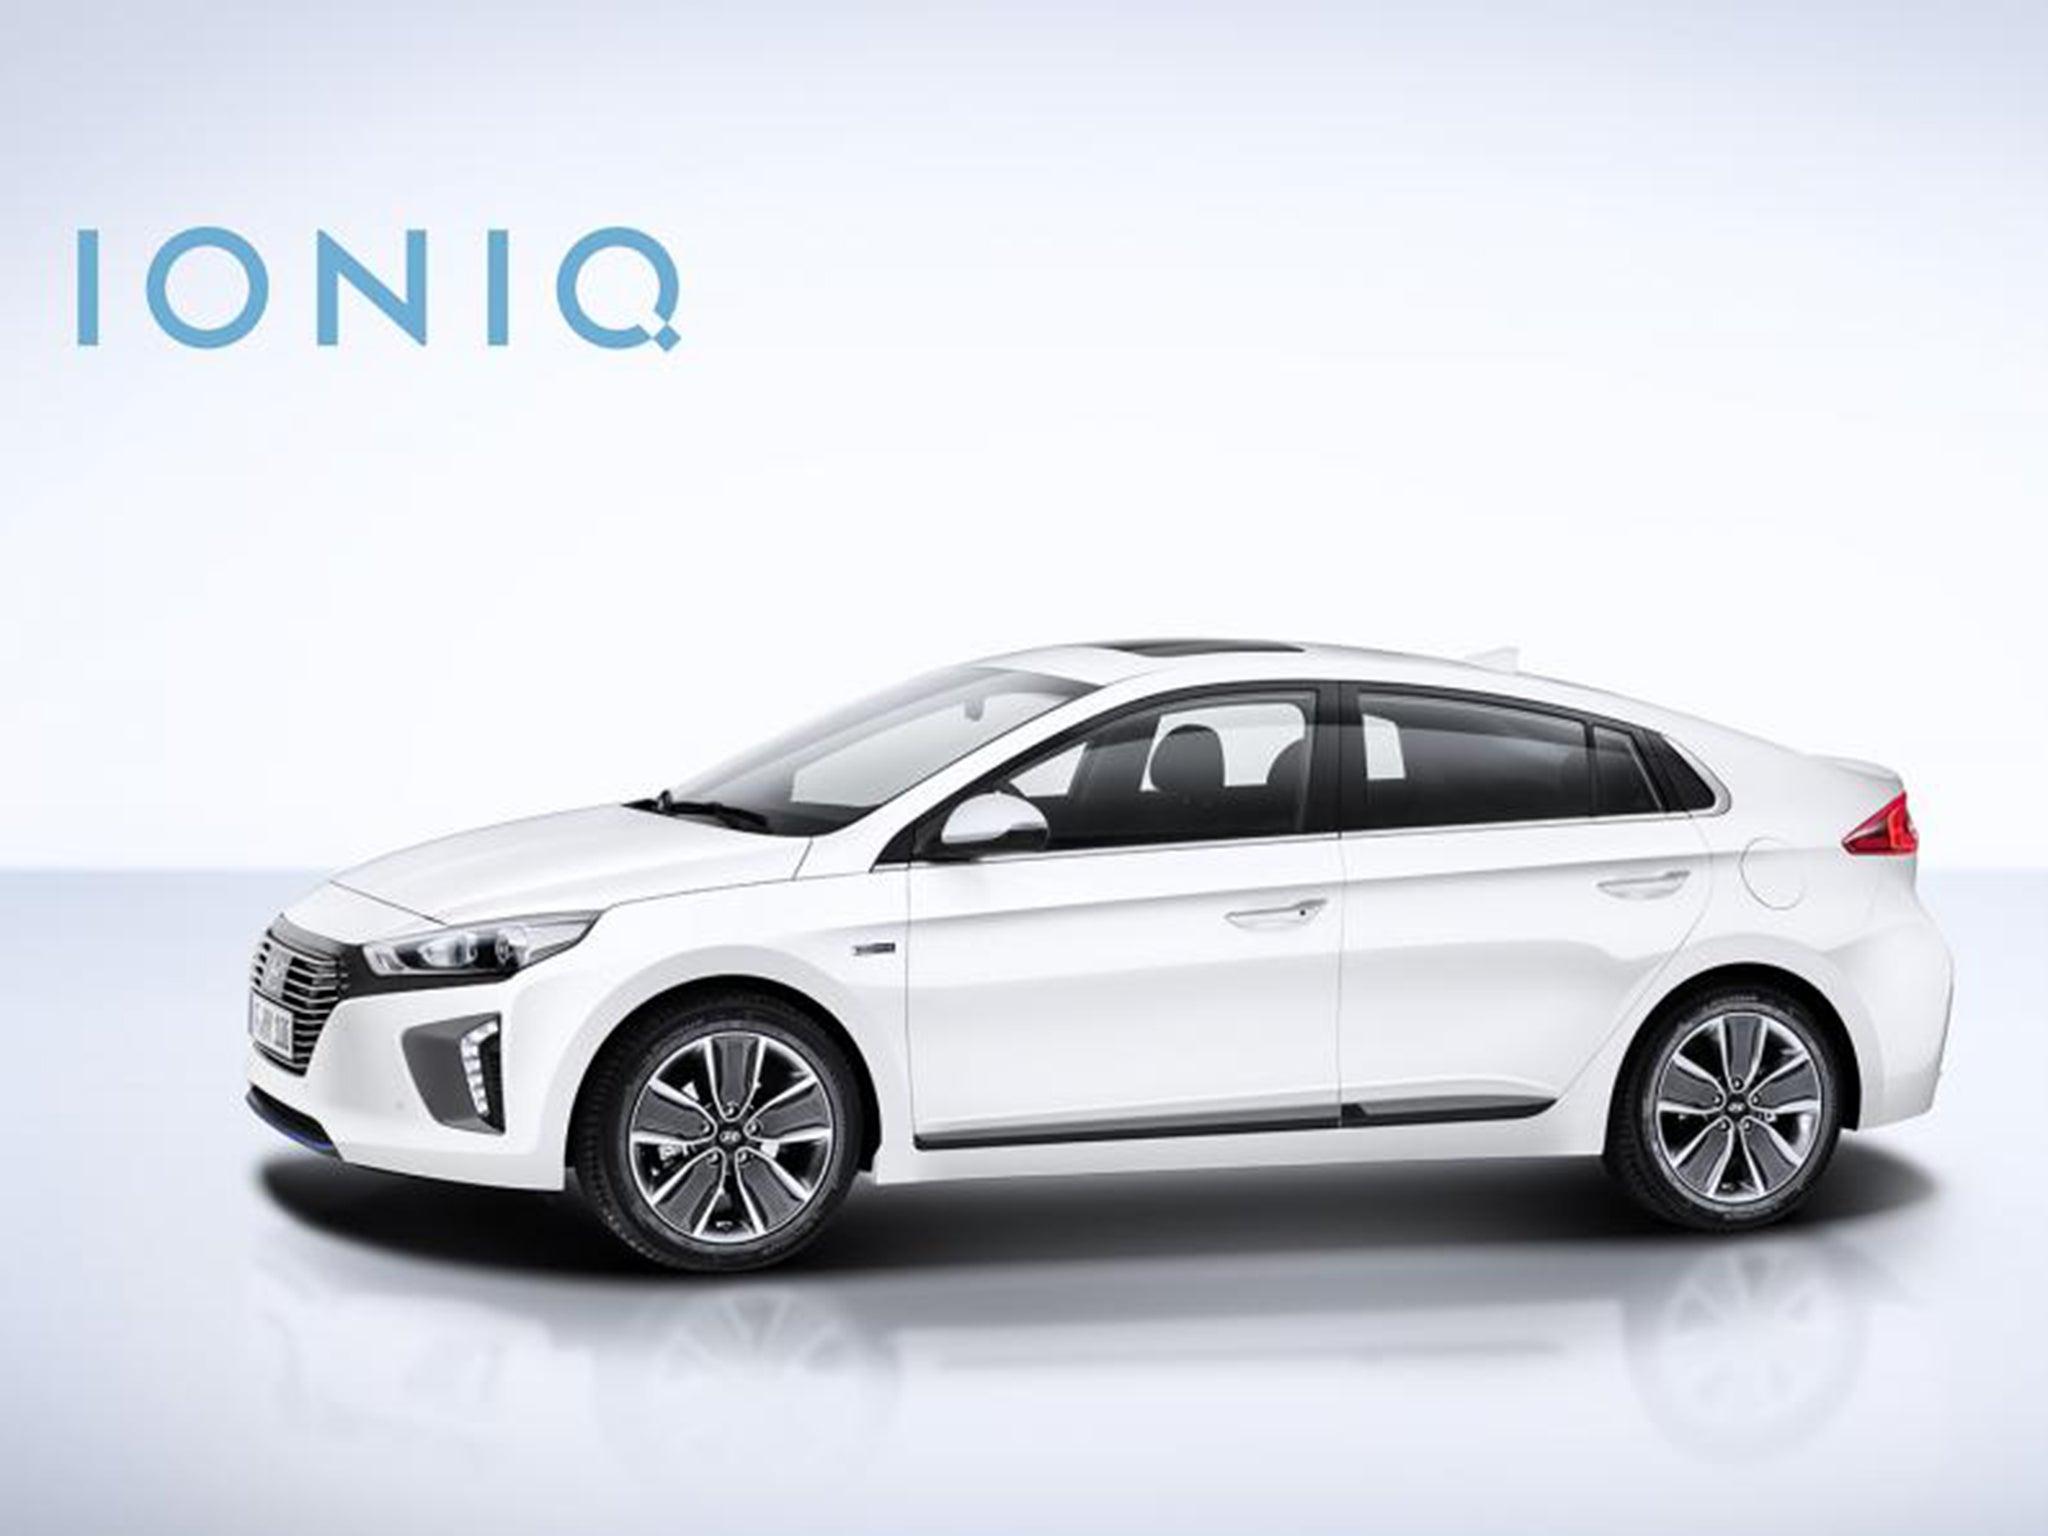 Hyundai Ioniq To Have Three Electric Options Within Single